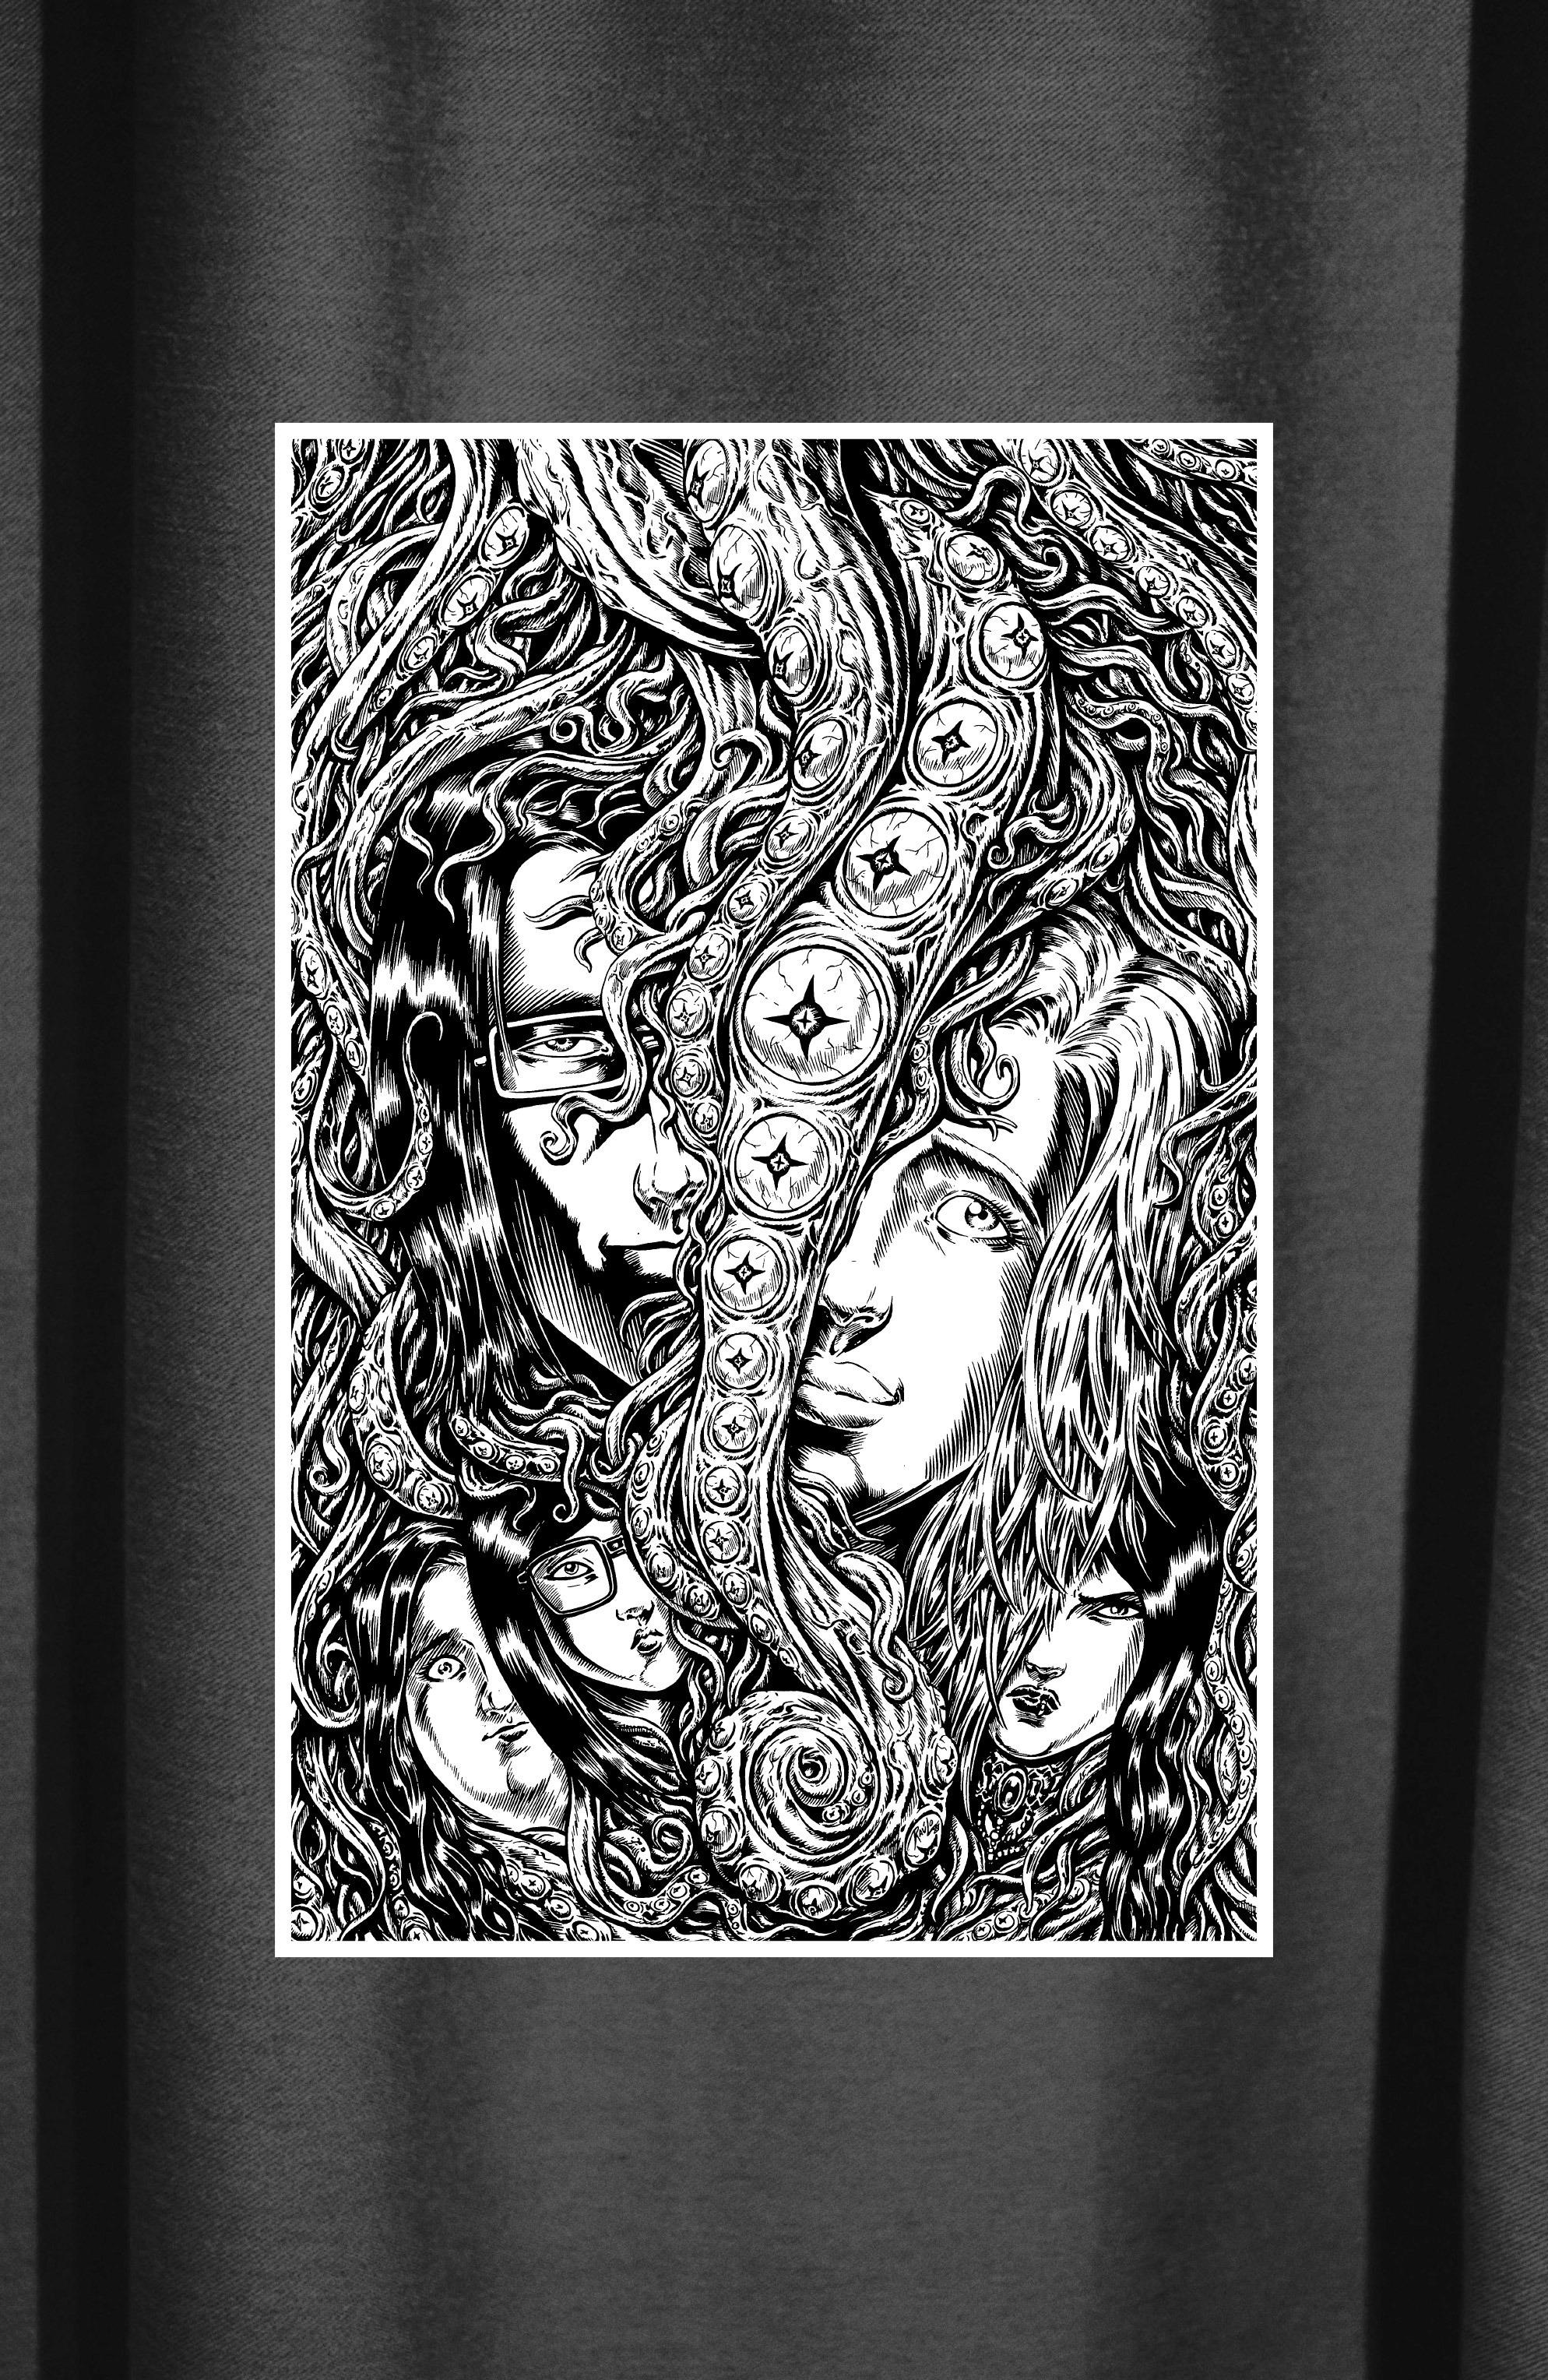 Read online Alan Moore's Cinema Purgatorio comic -  Issue #1 - 14